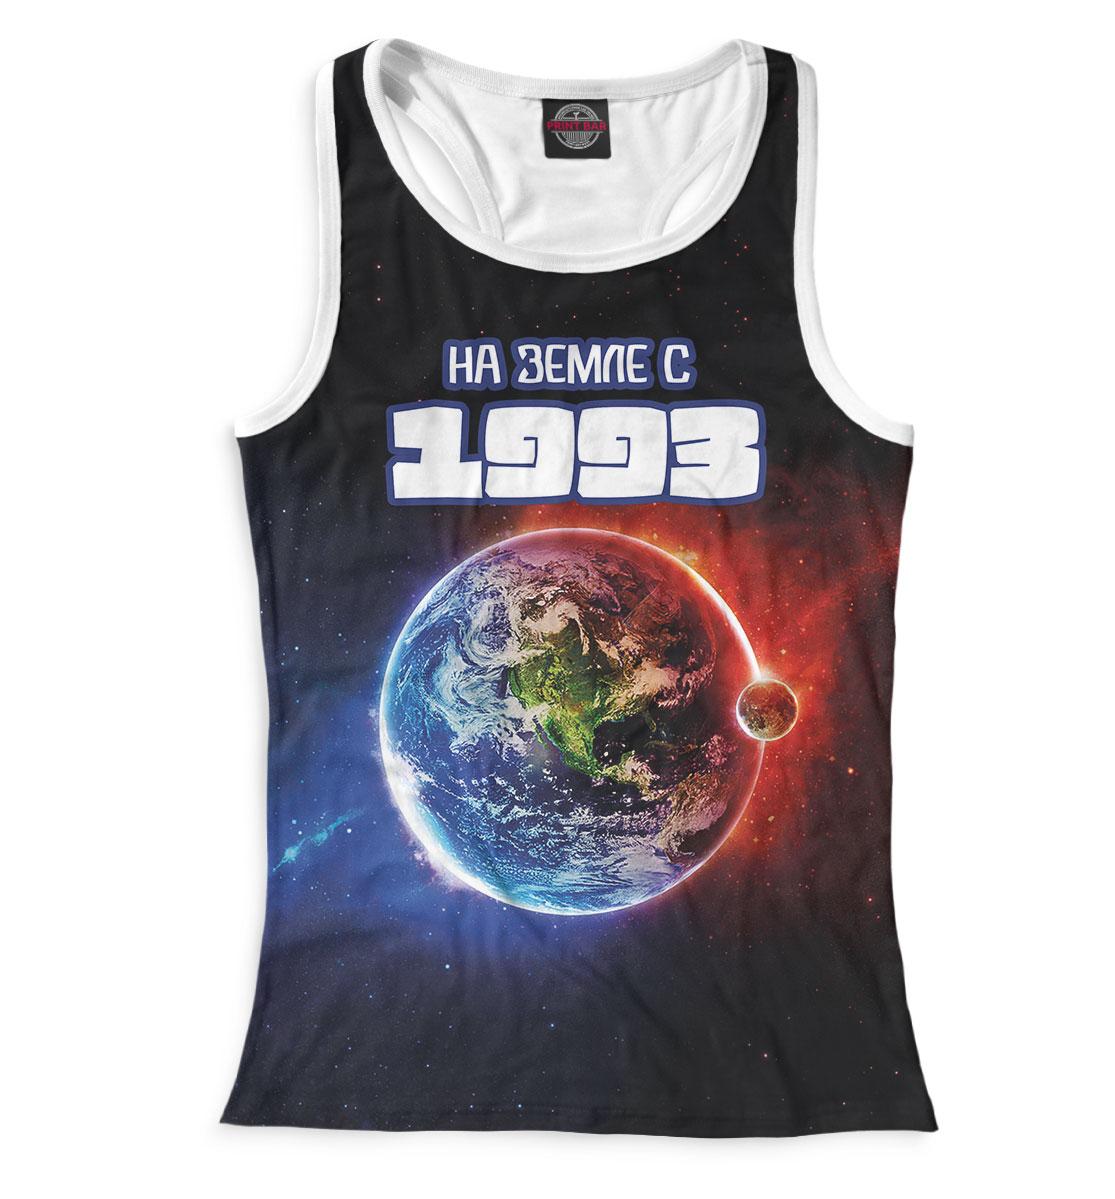 Купить На Земле с 1993, Printbar, Майки борцовки, DDT-870080-mayb-1